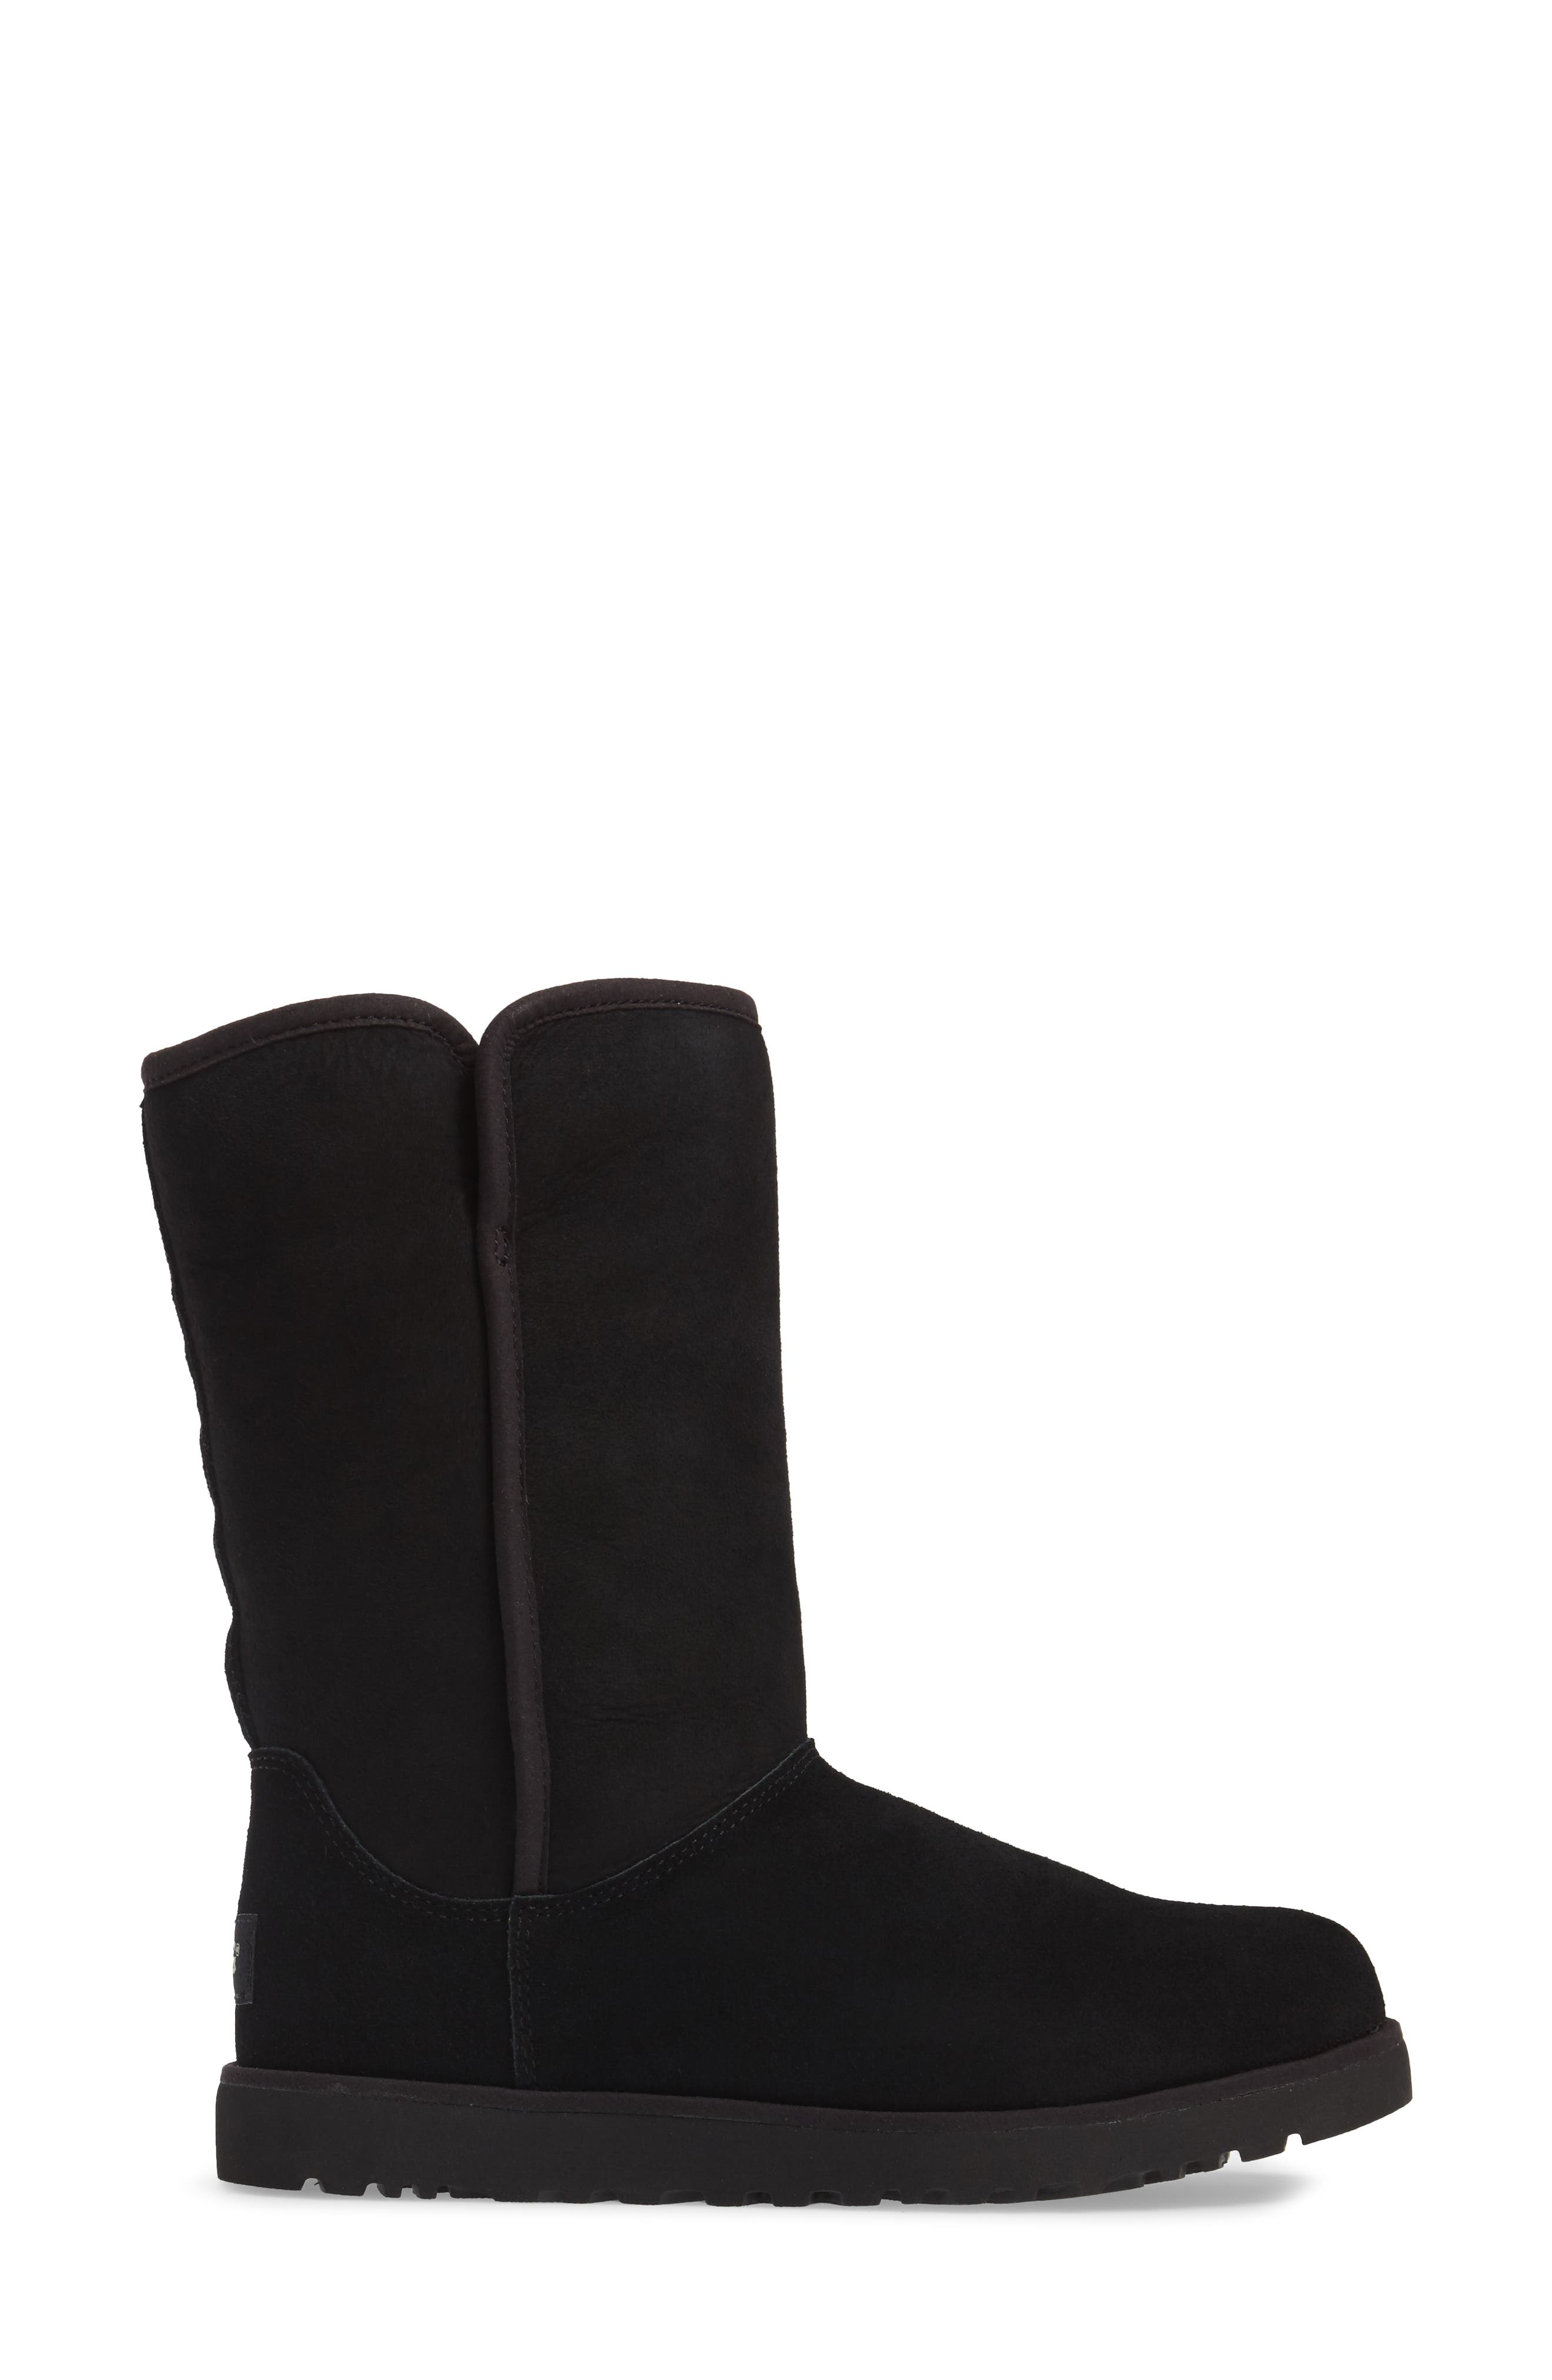 'Michelle' Boot,                             Alternate thumbnail 3, color,                             BLACK SUEDE